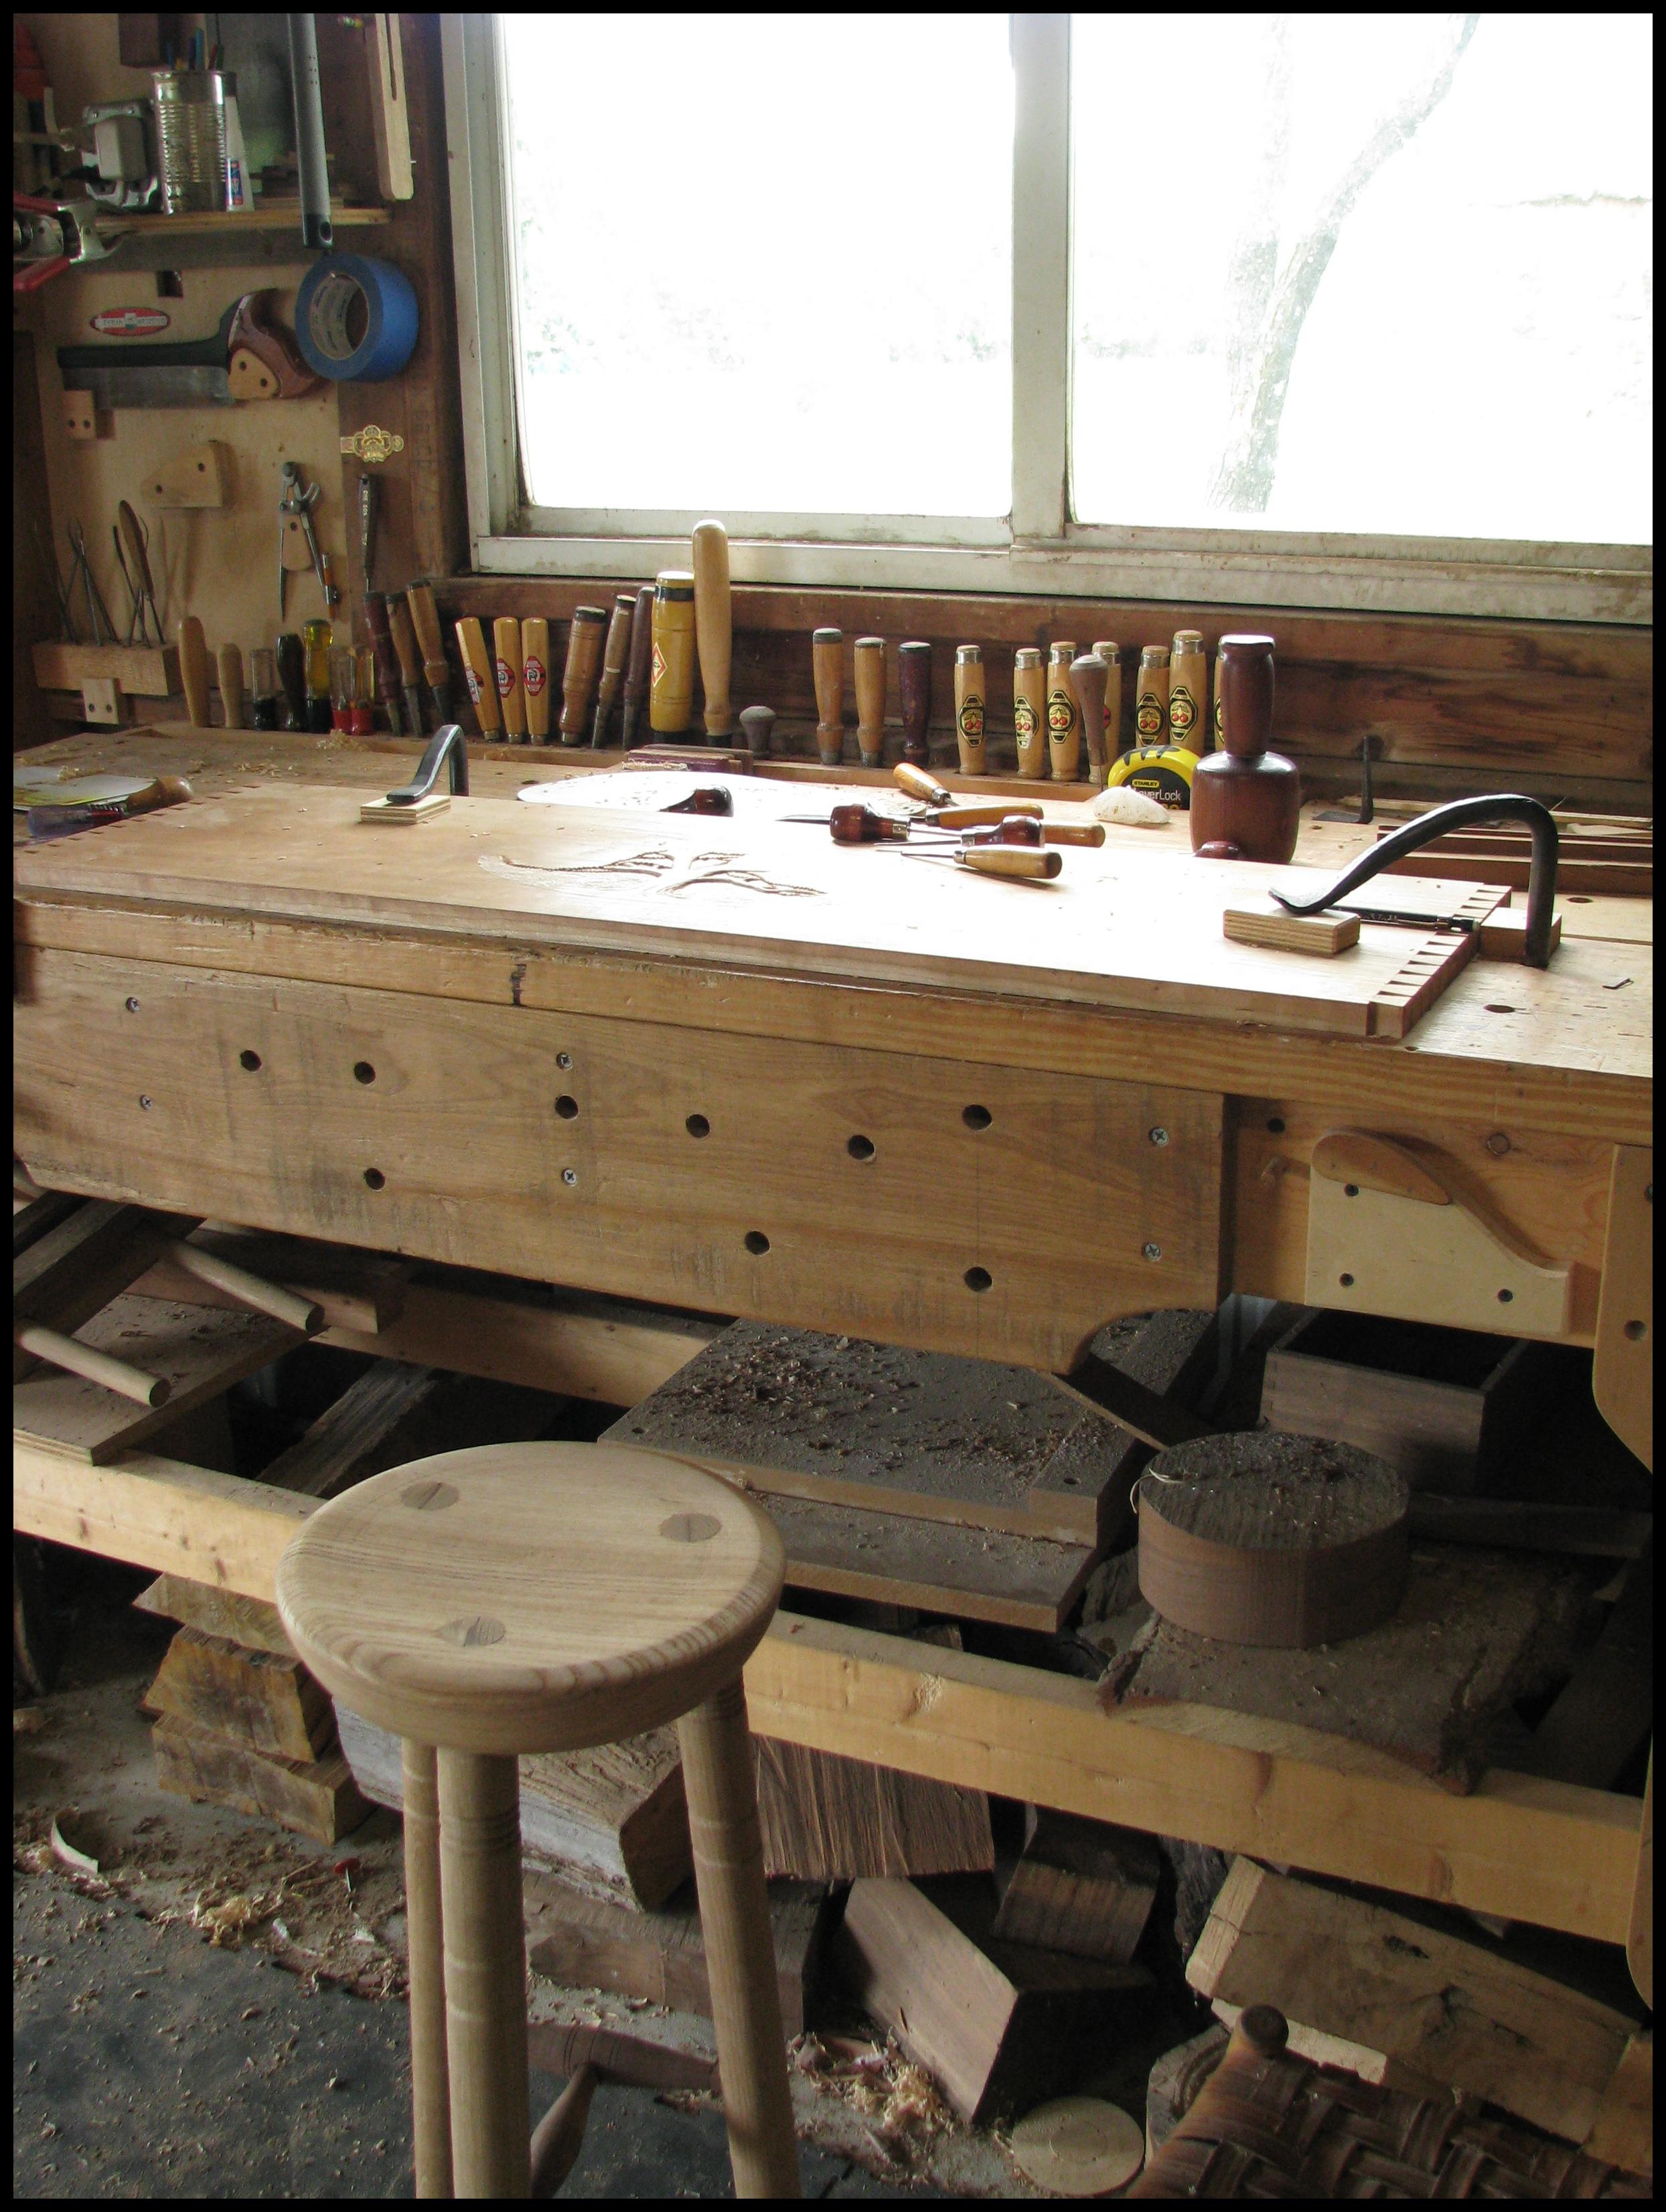 Wood Carving Workshops Pdf Woodworking